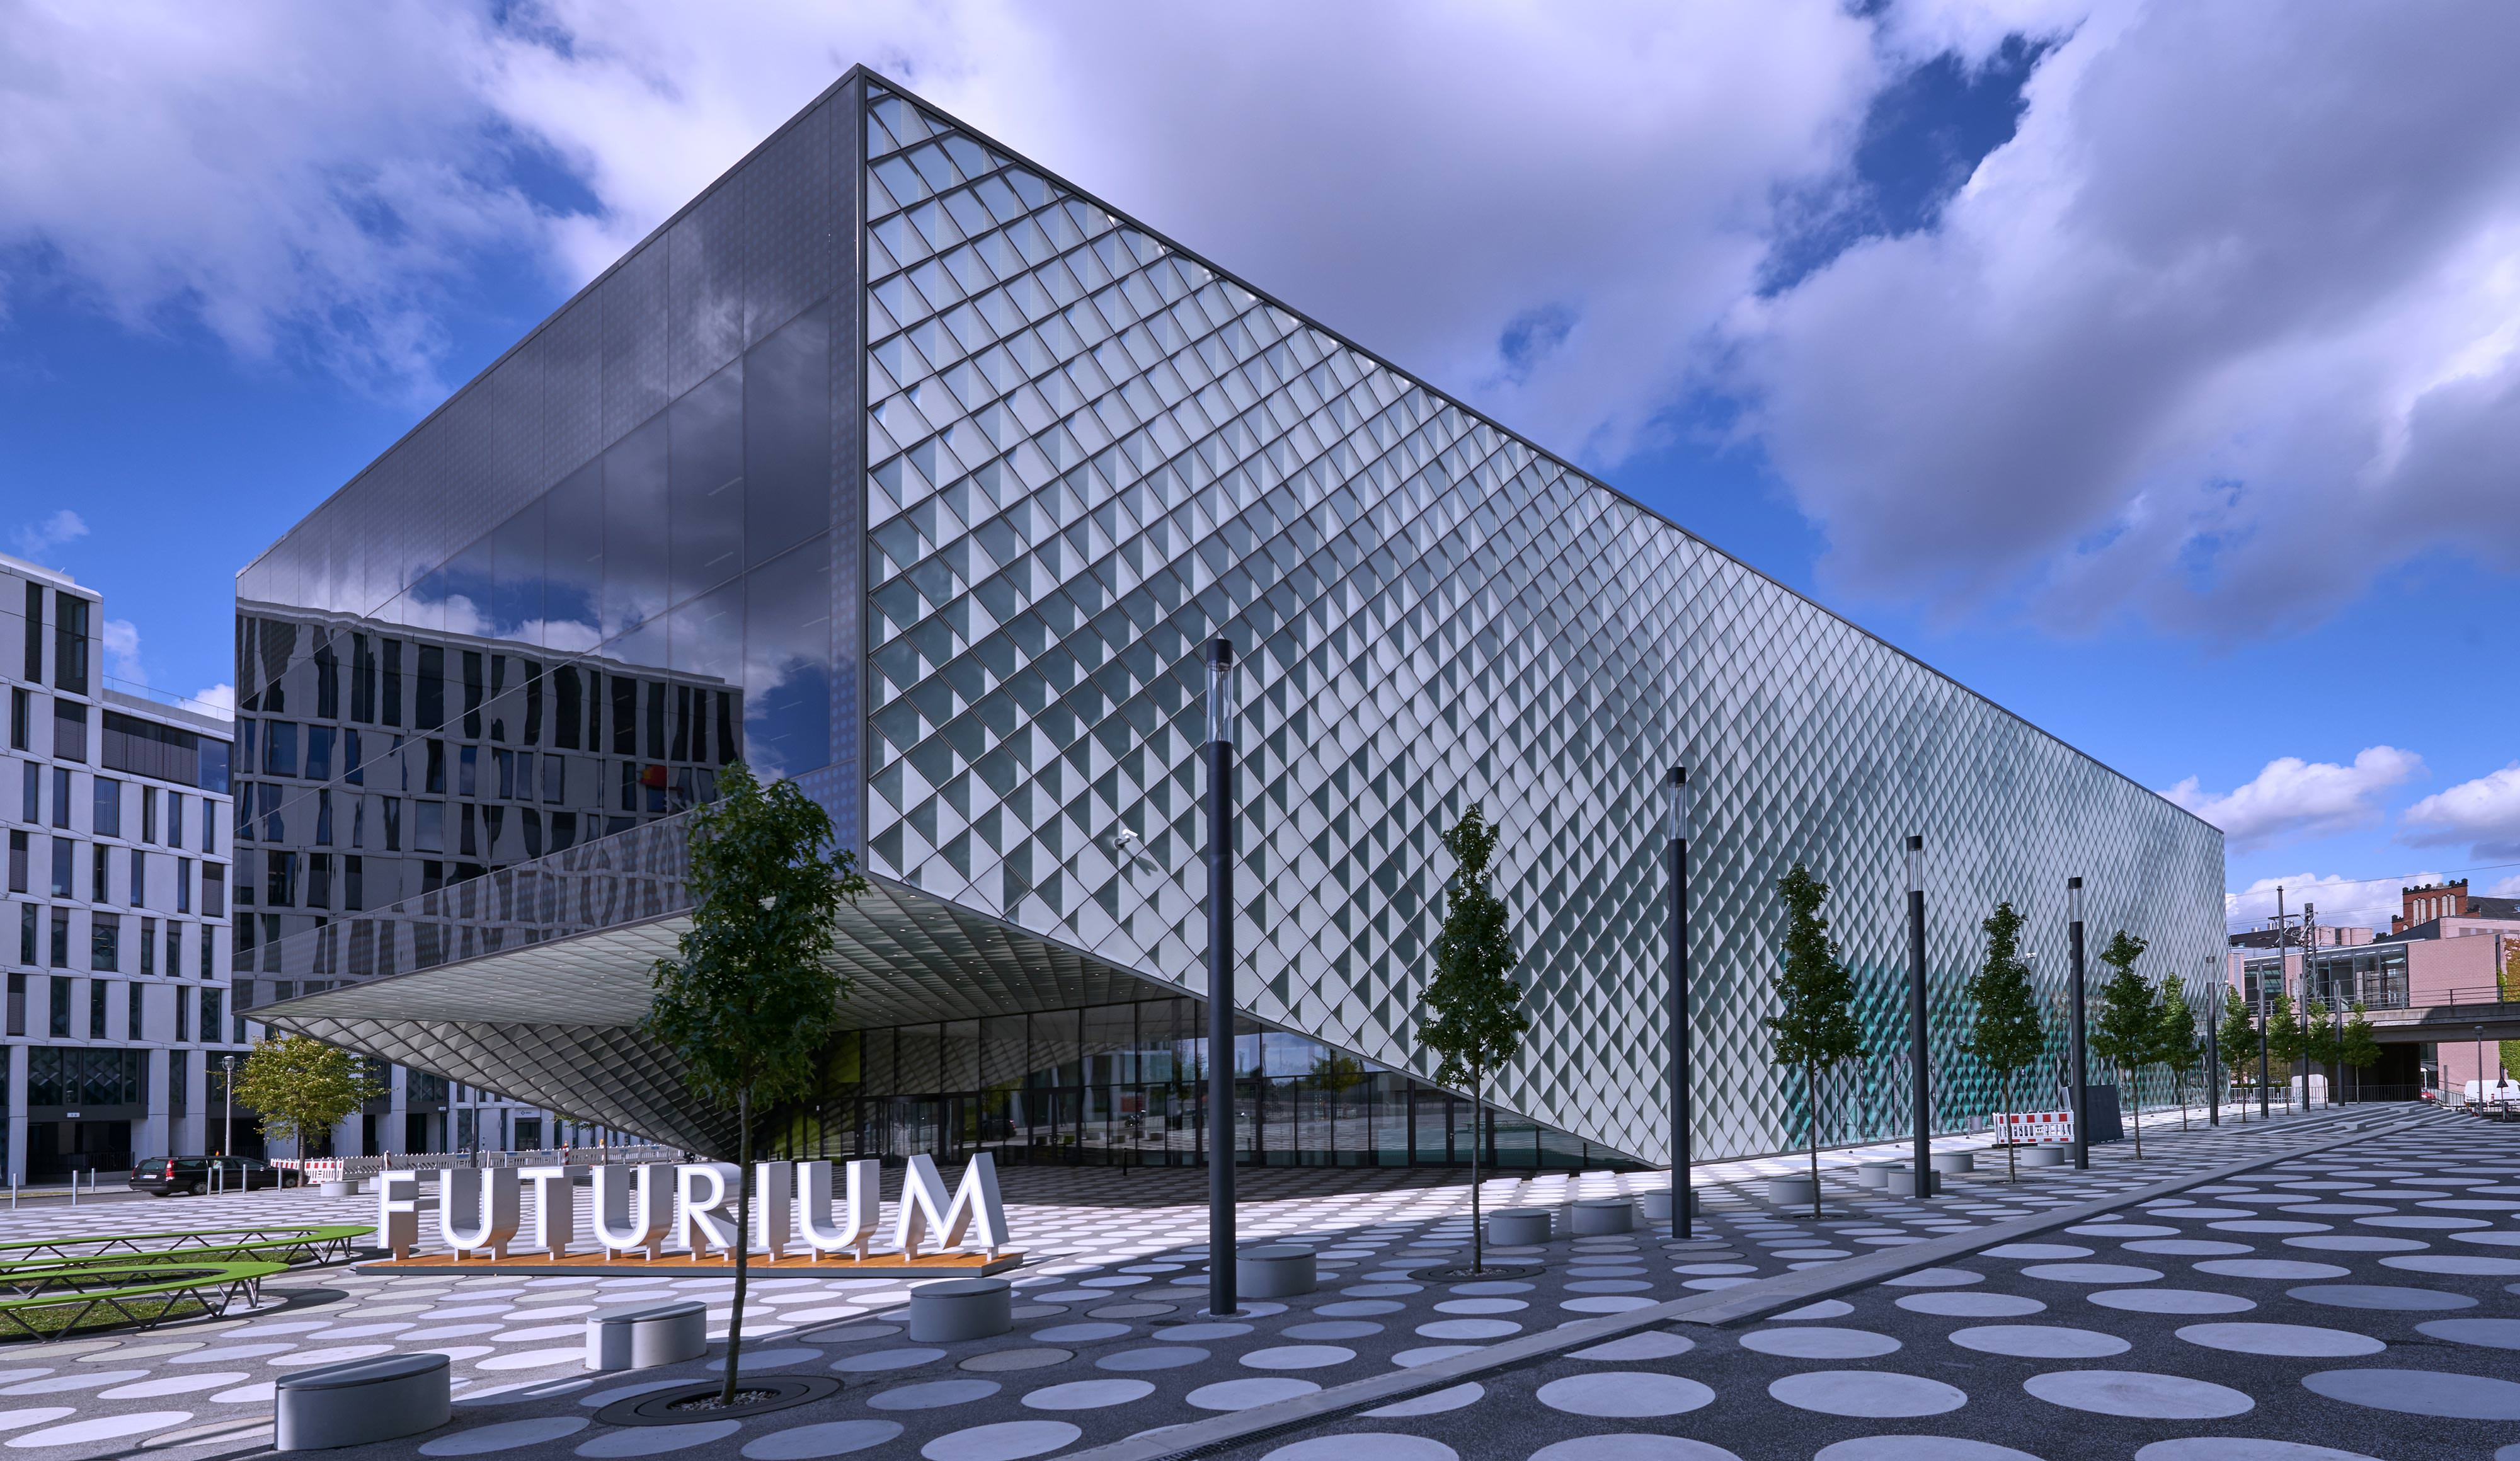 Berlins Futurium In Bedruckter Gussglash 252 Lle